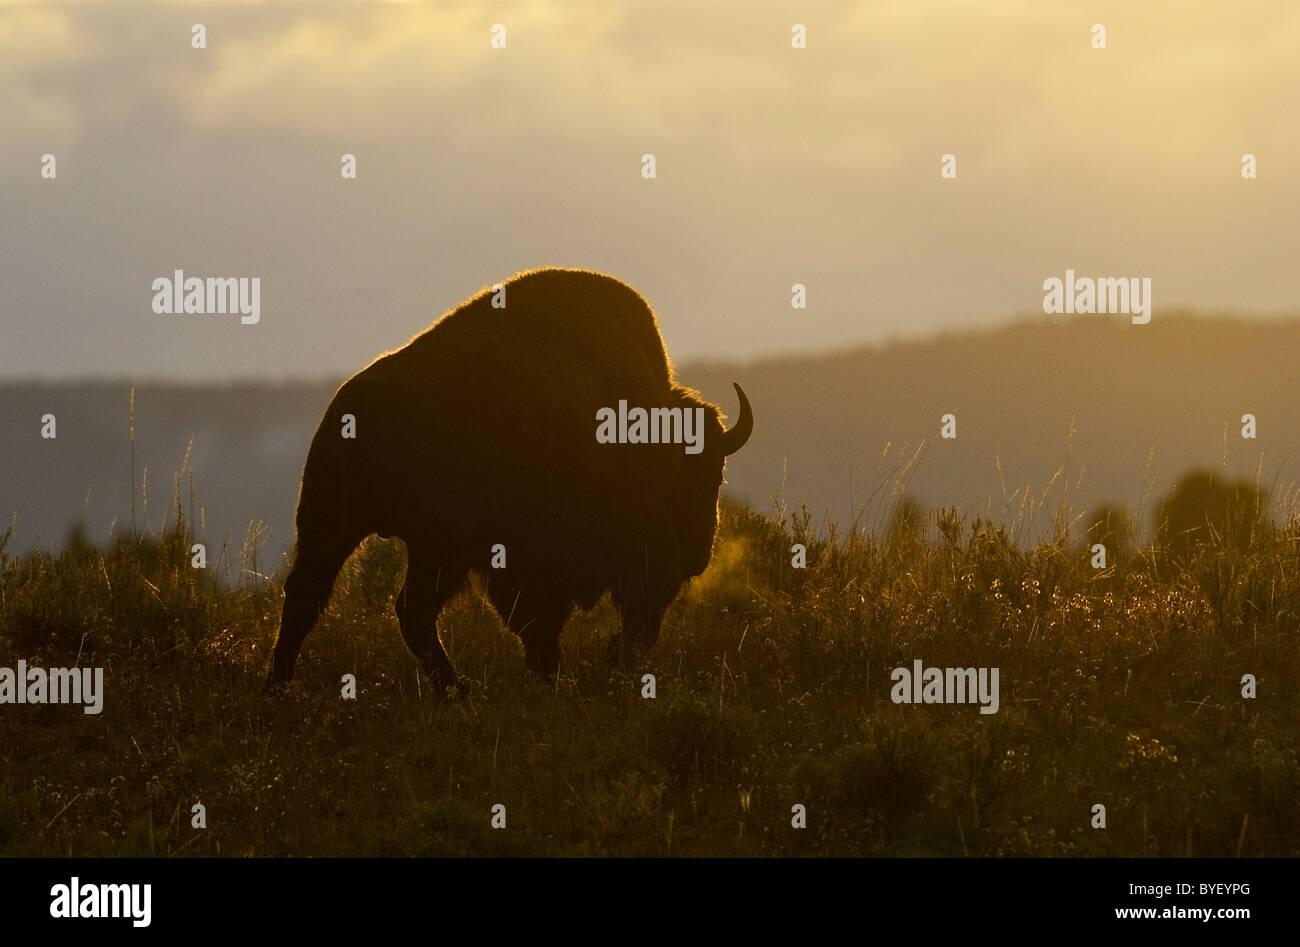 Buffalo Bull at Sunrise - Stock Image